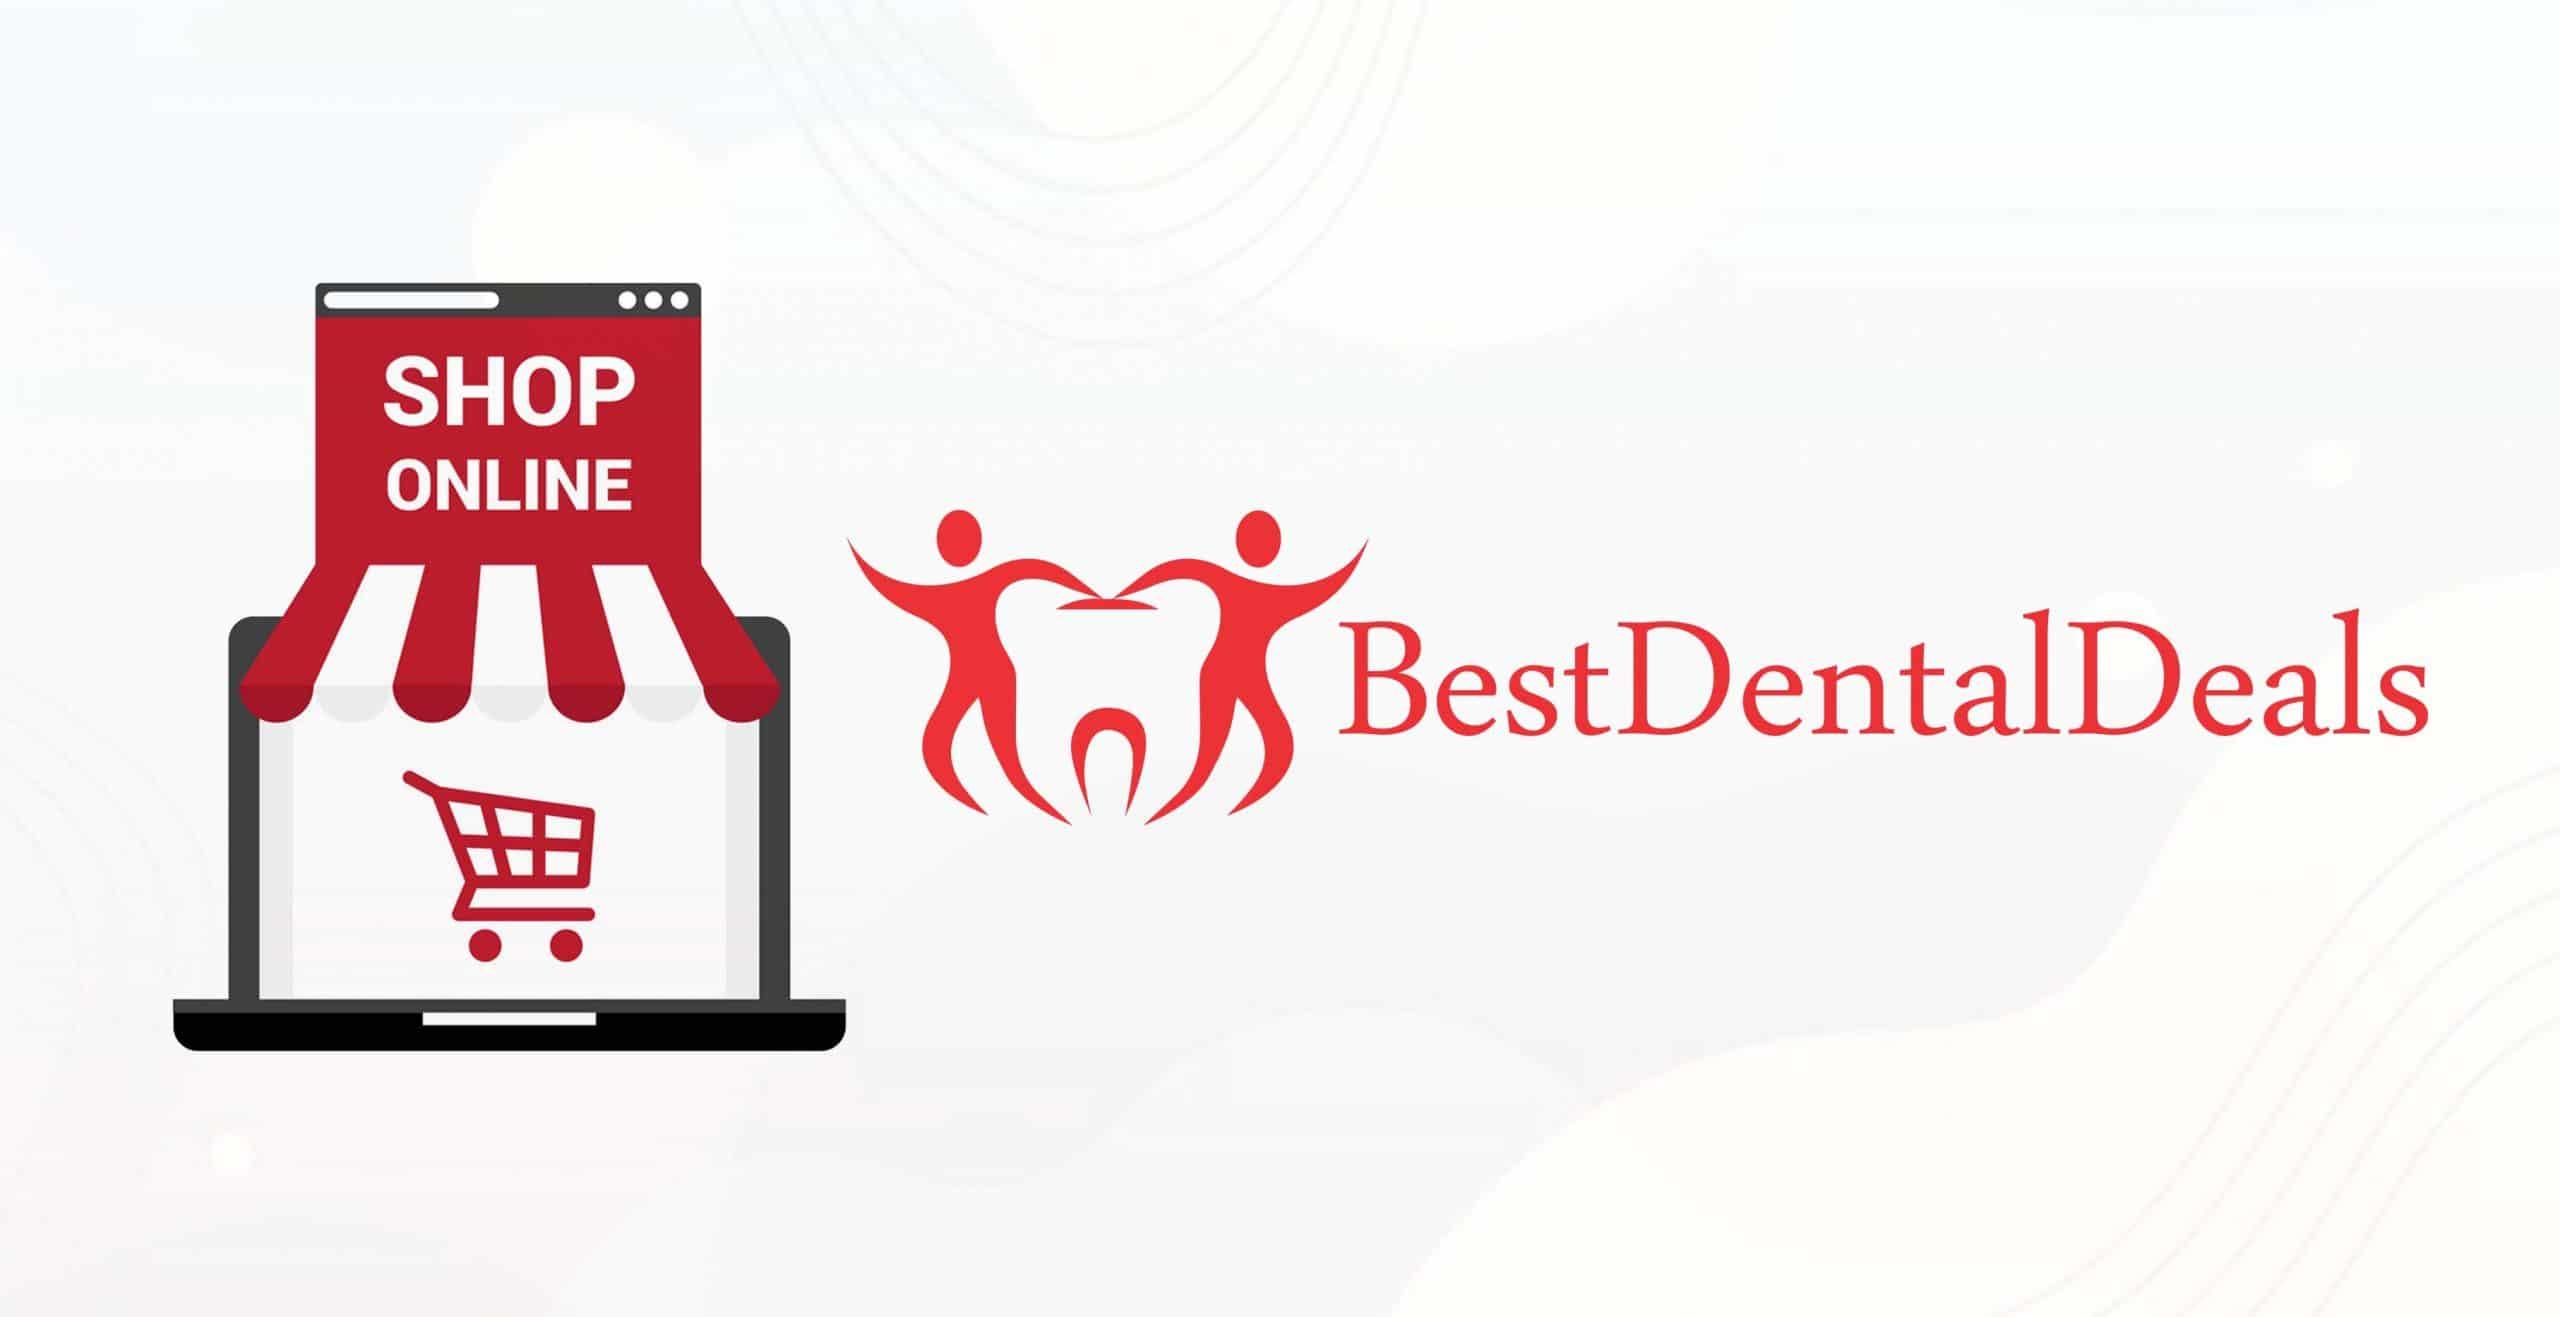 Shop best dental deals online